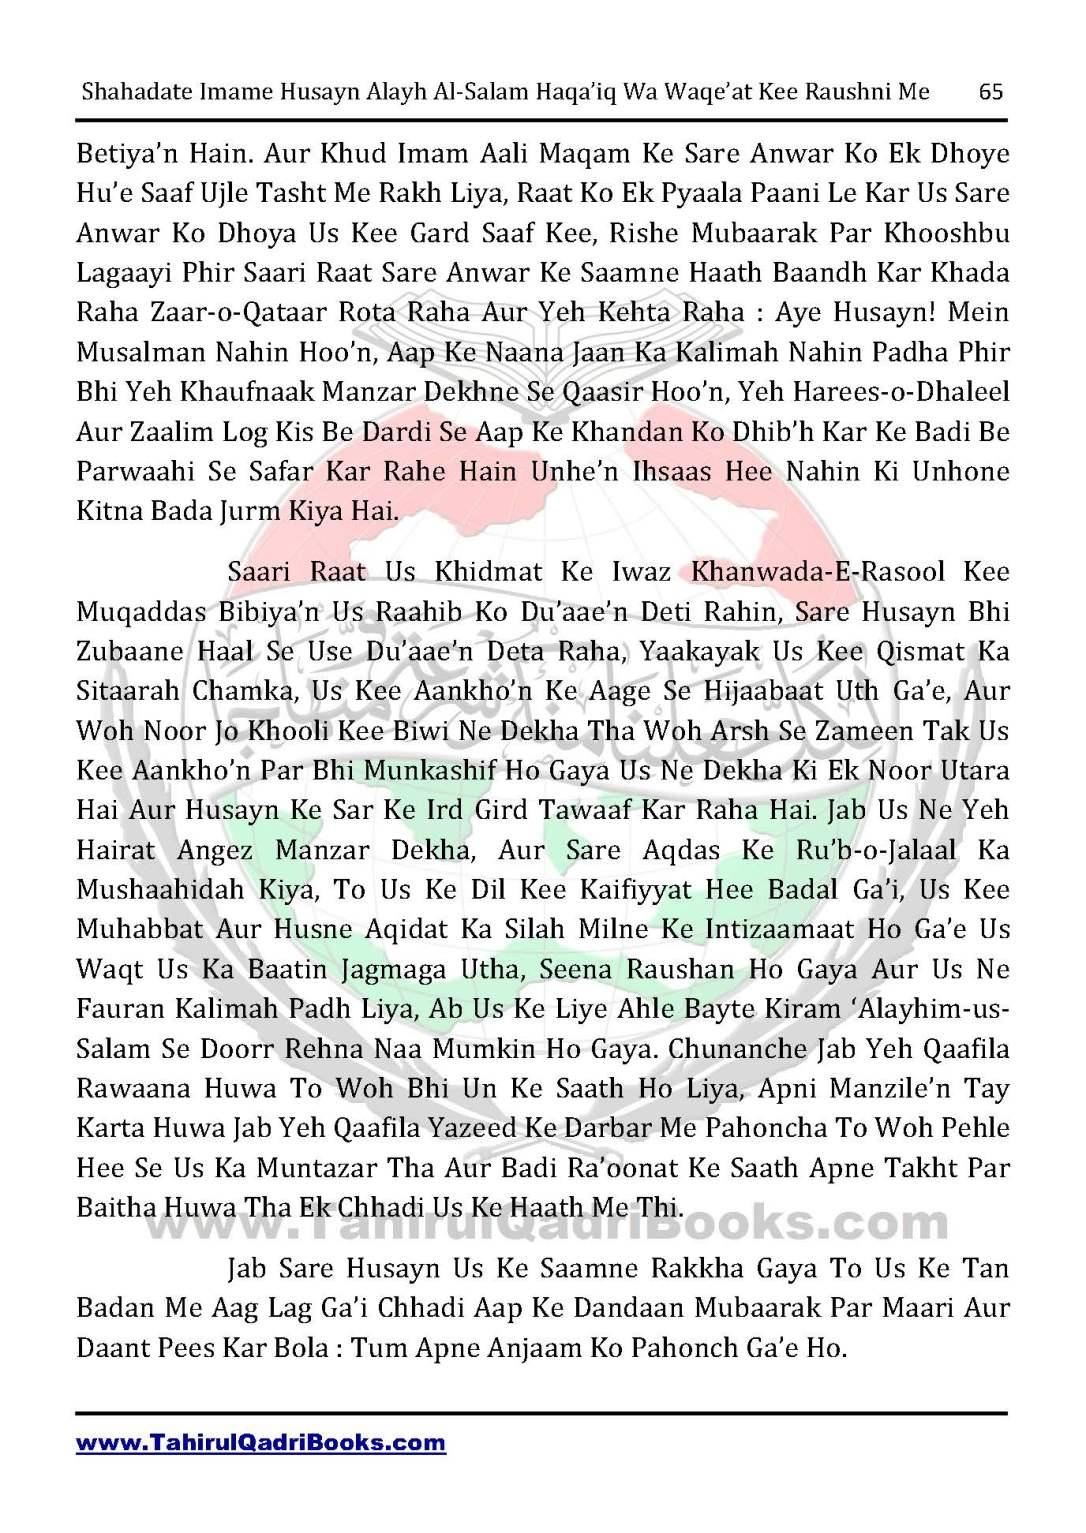 shahadate-imame-husayn-alayh-is-salam-haqaiq-wa-waqe_at-kee-raushni-me-in-roman-urdu-unlocked_Page_65